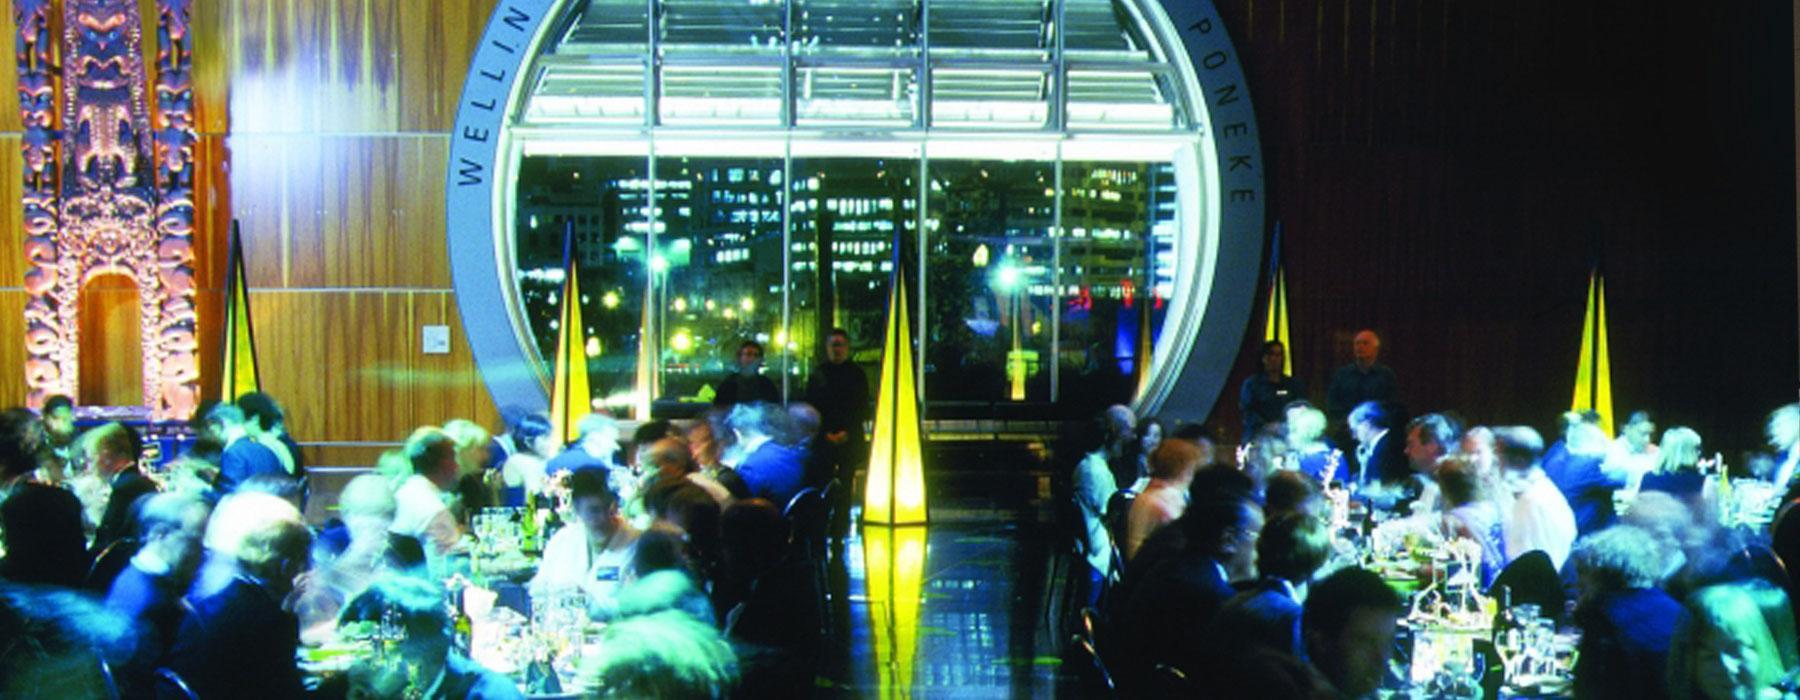 Wellington Foyer - Round window